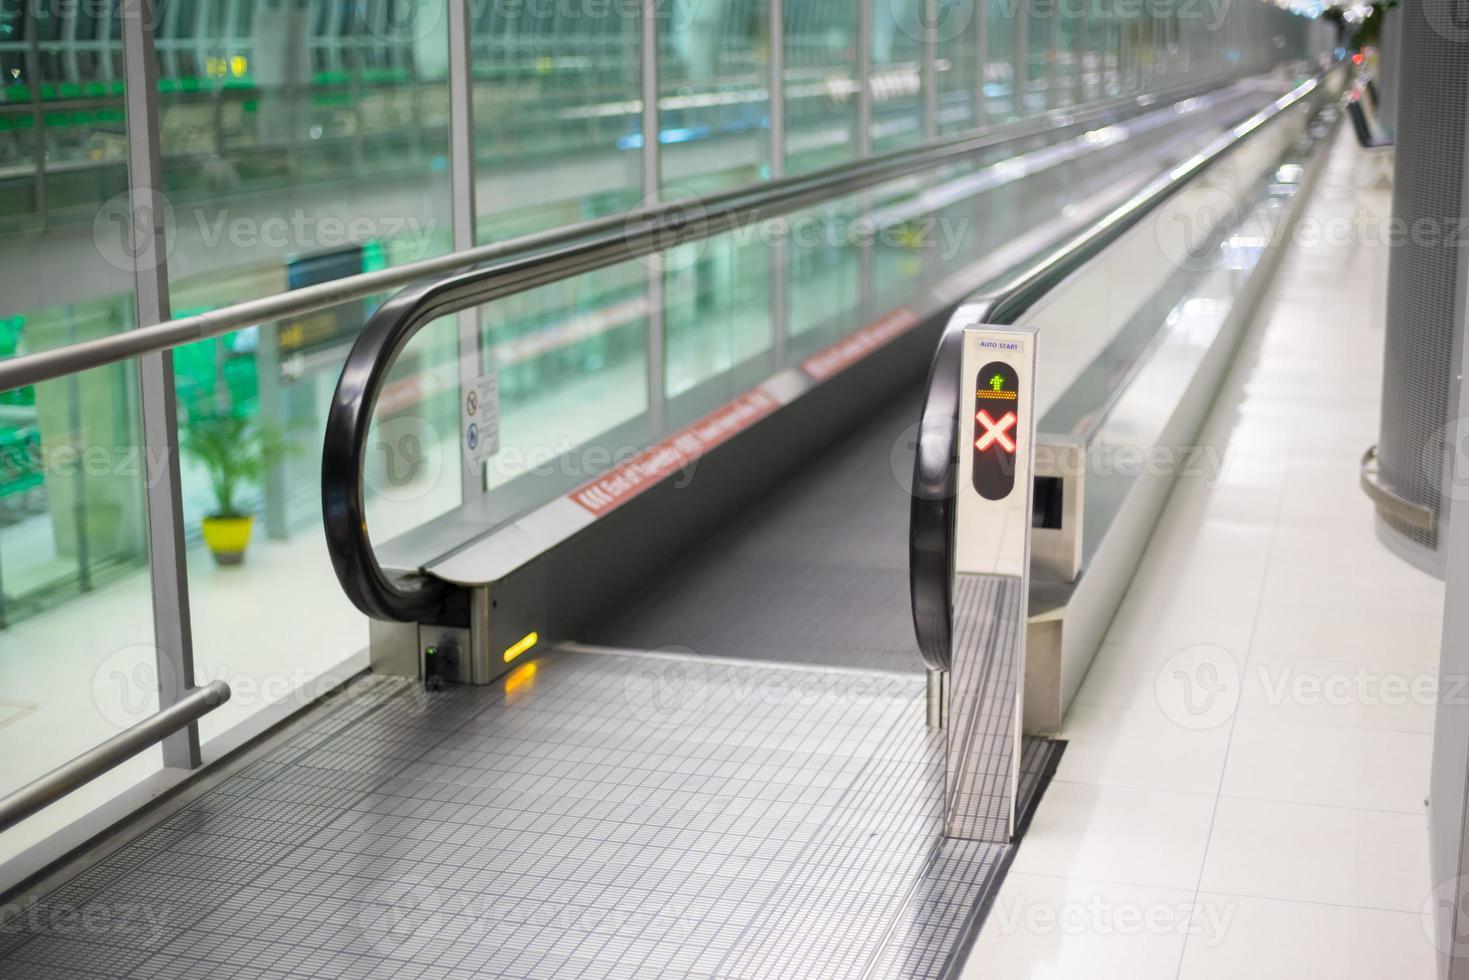 passarelas no aeroporto para passageiros foto